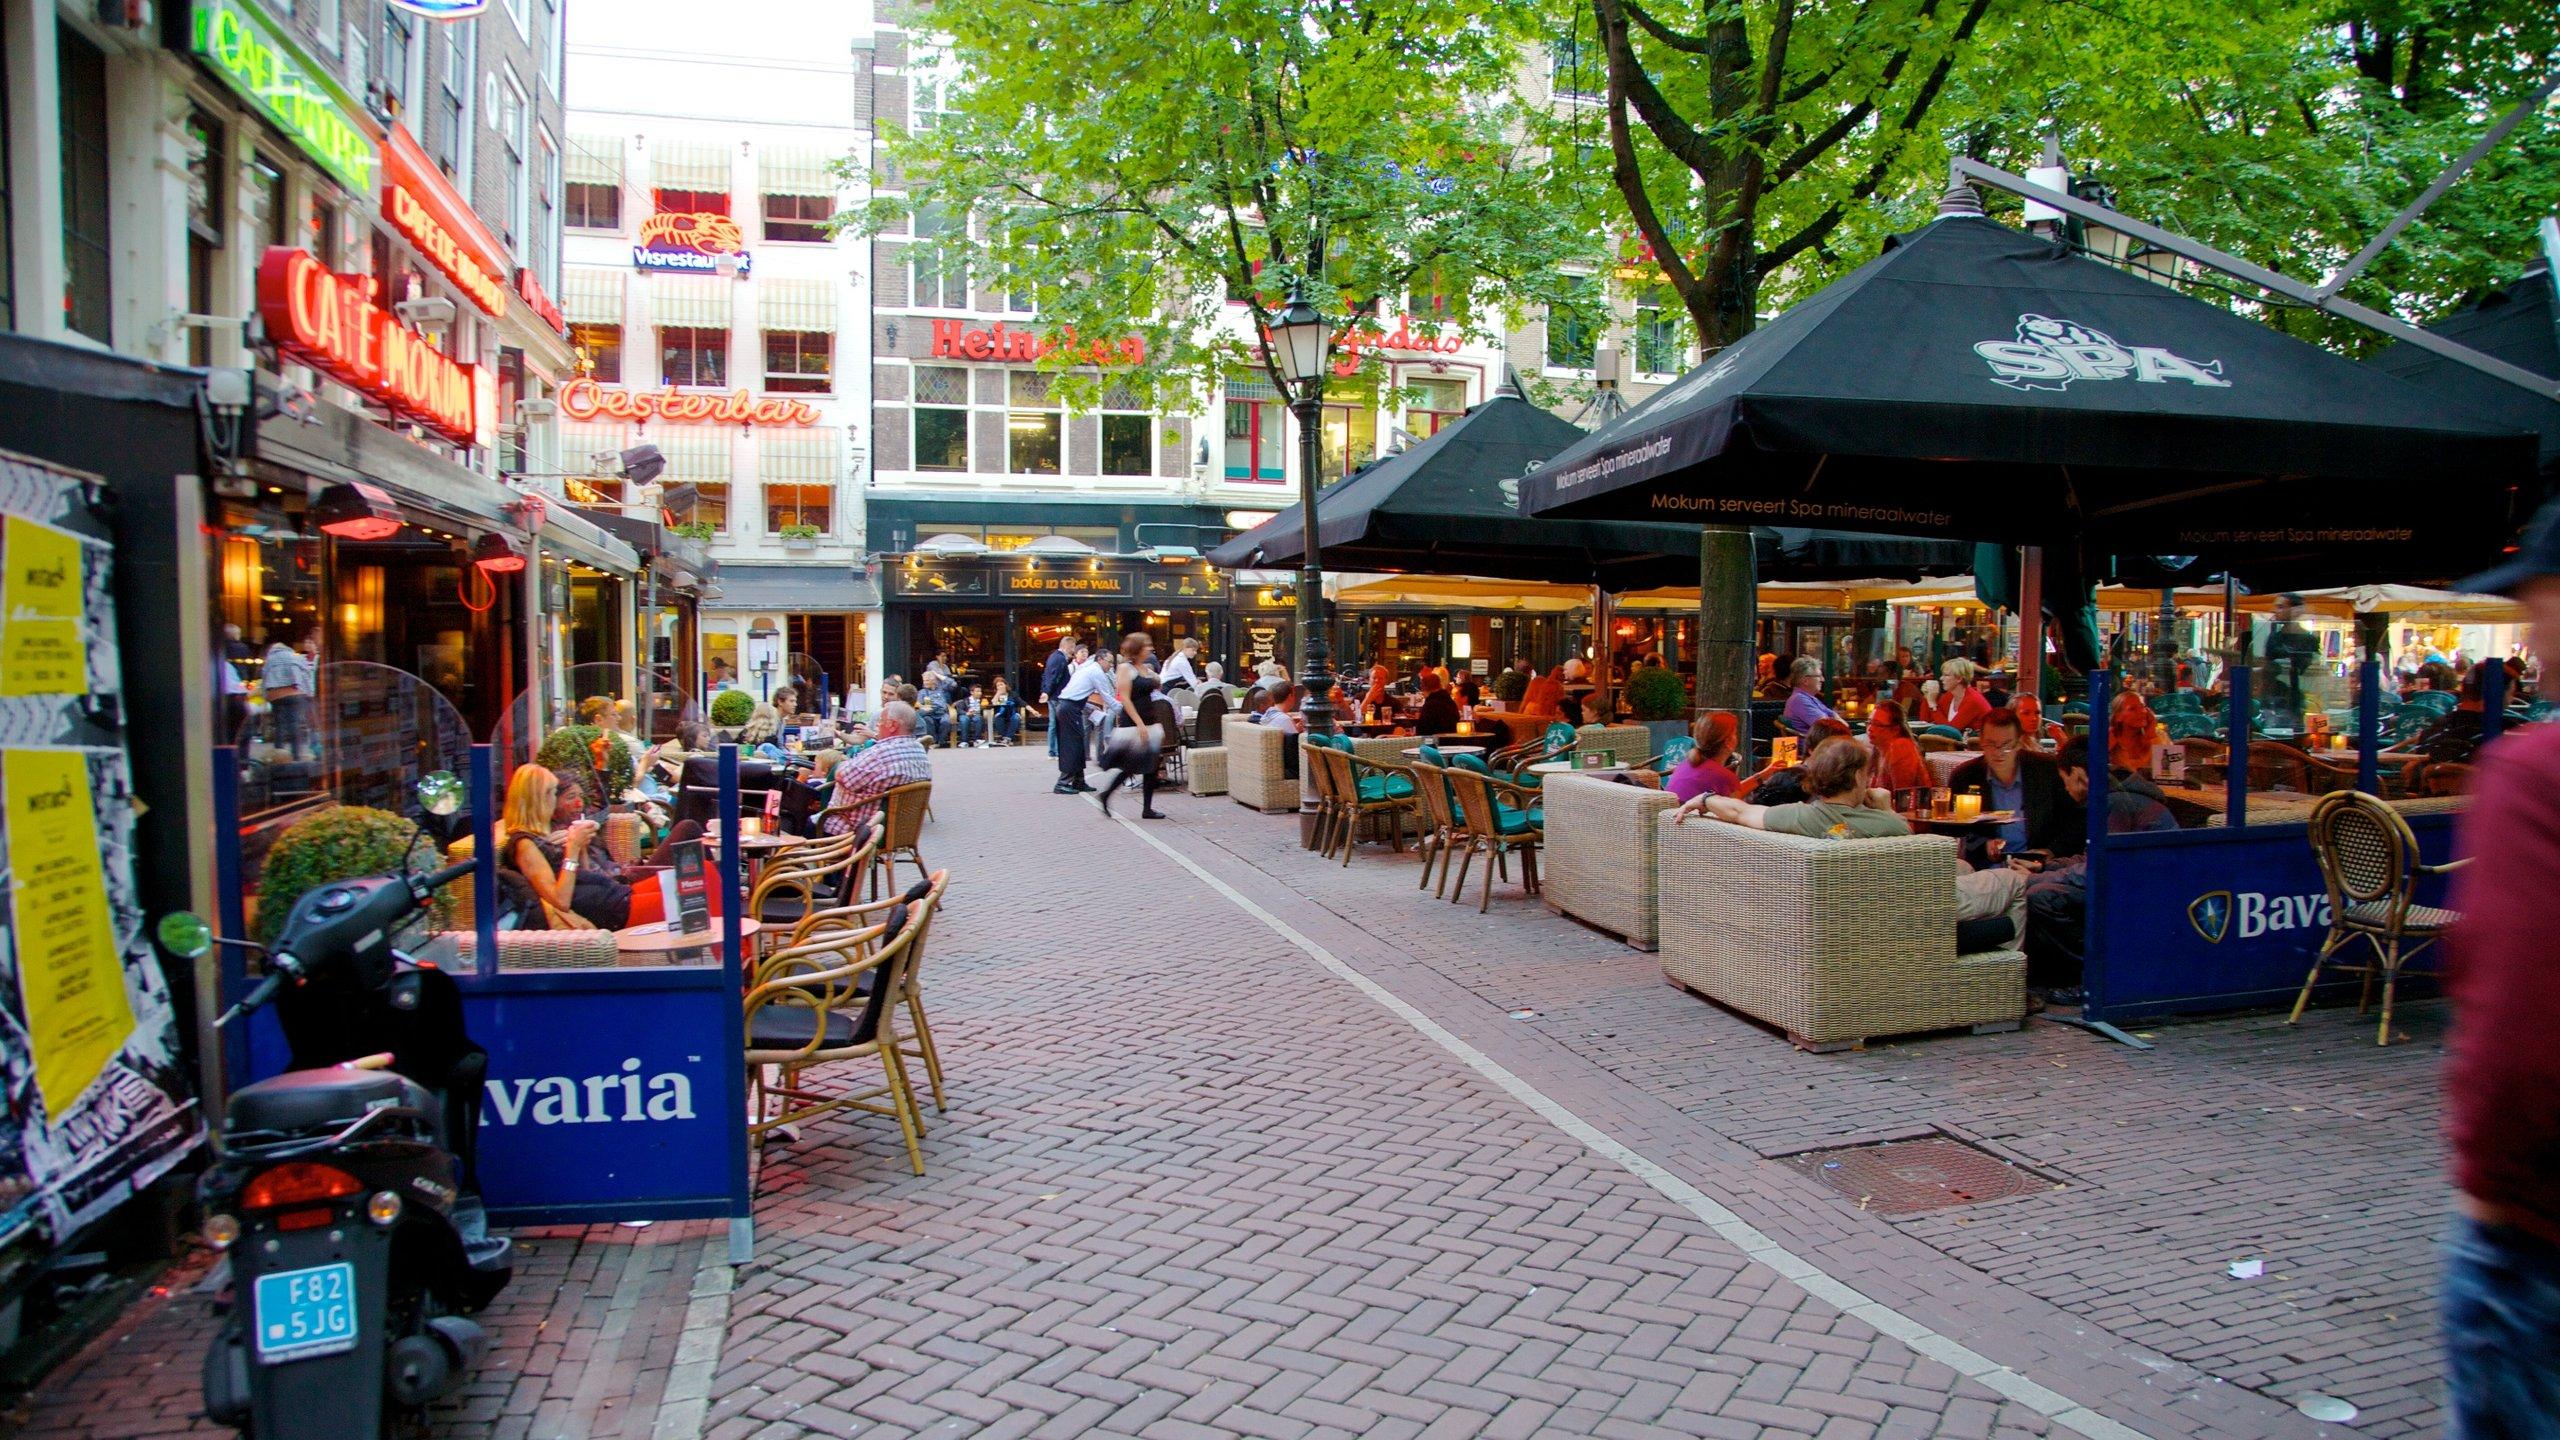 De Weteringschans, Amsterdam, North Holland, Netherlands